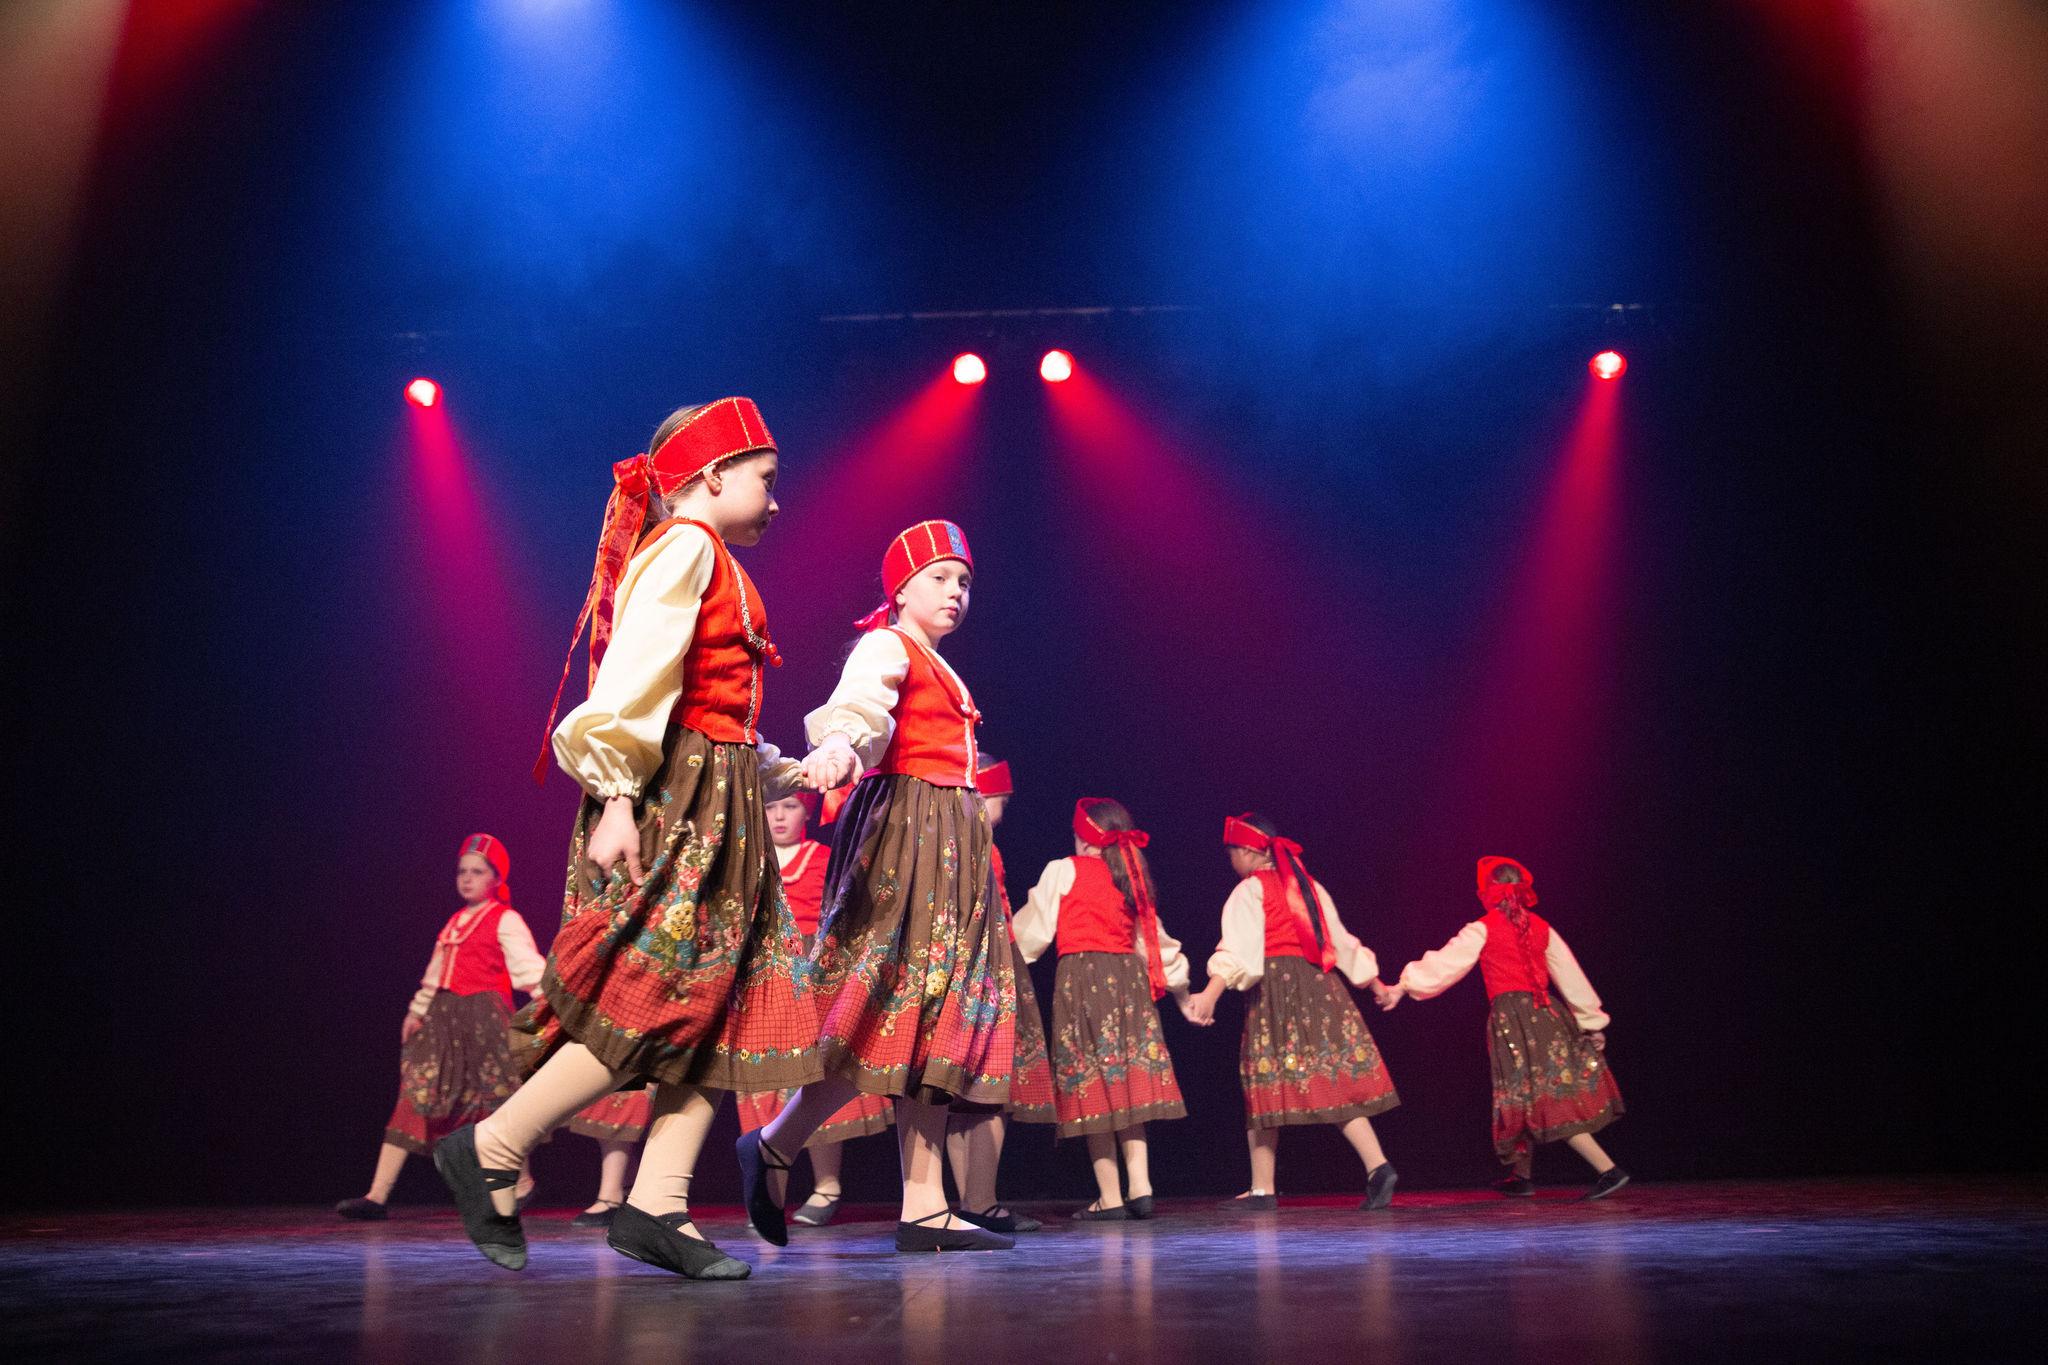 Manigance école de danse groupe Novice